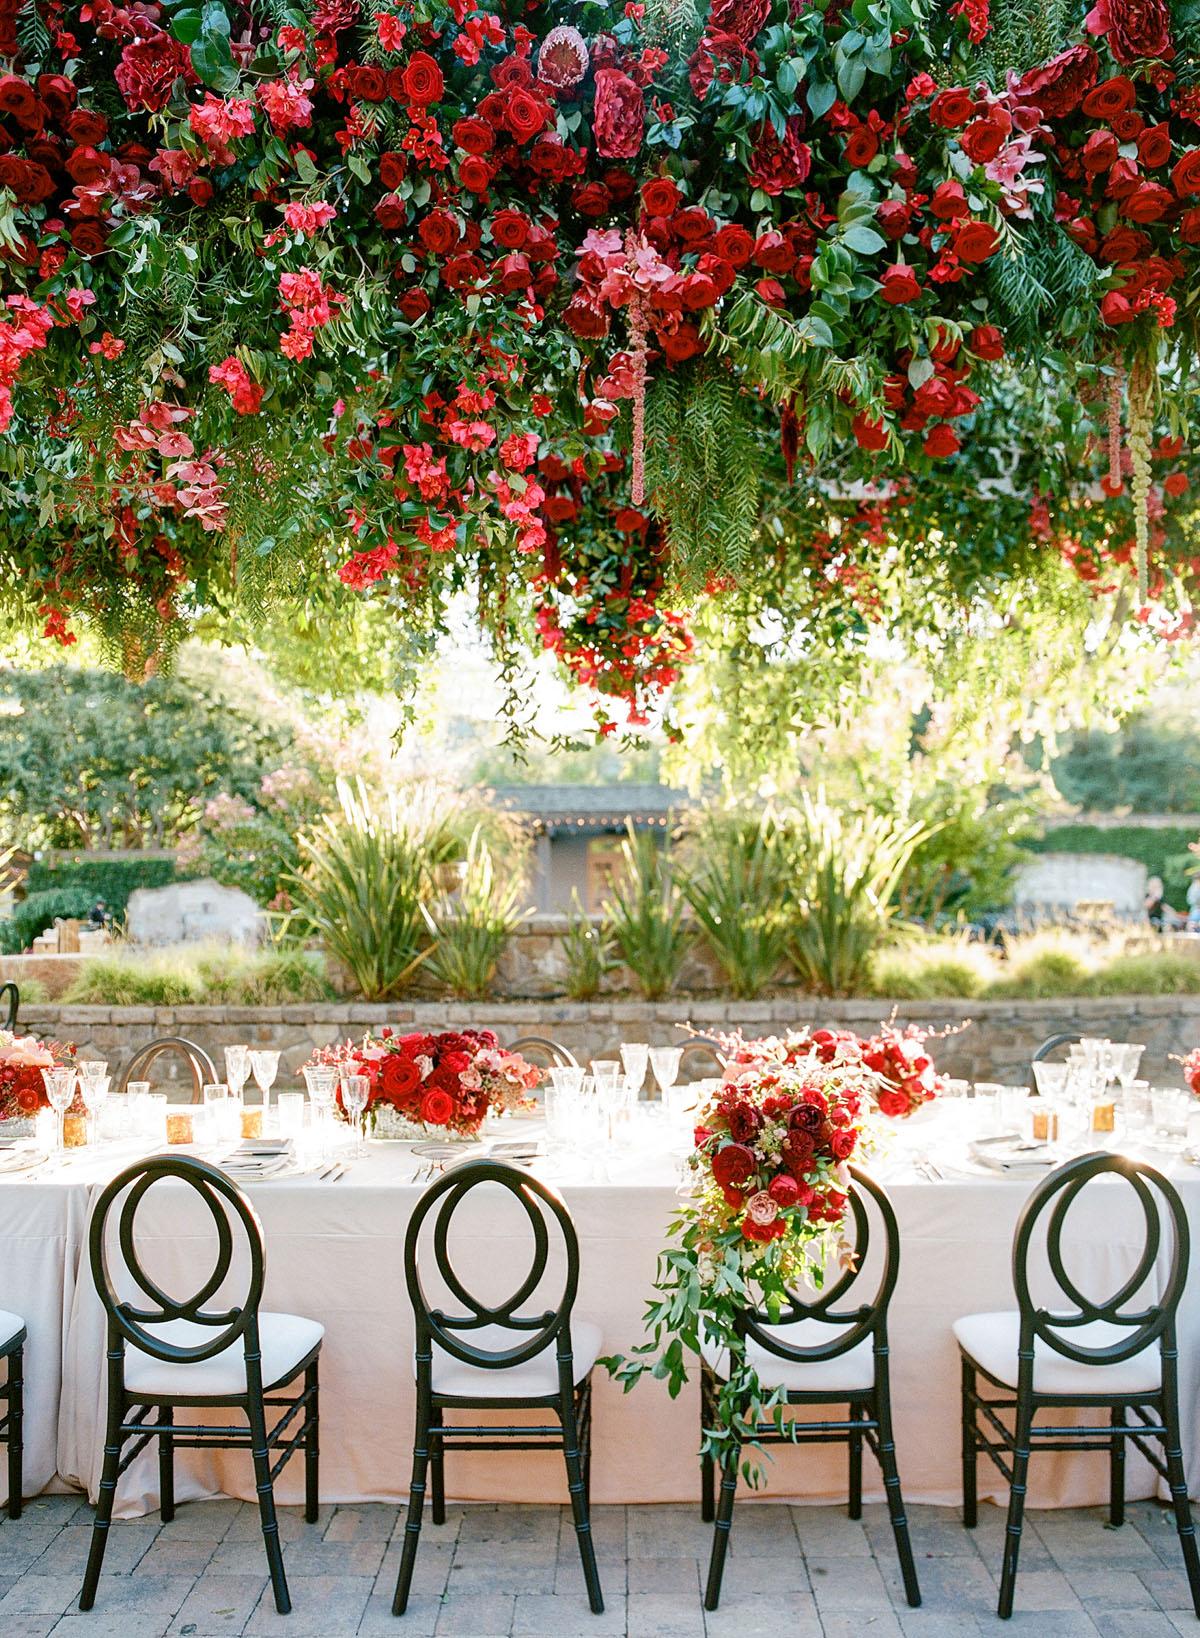 52-red-pink-floral-chandelier.jpg